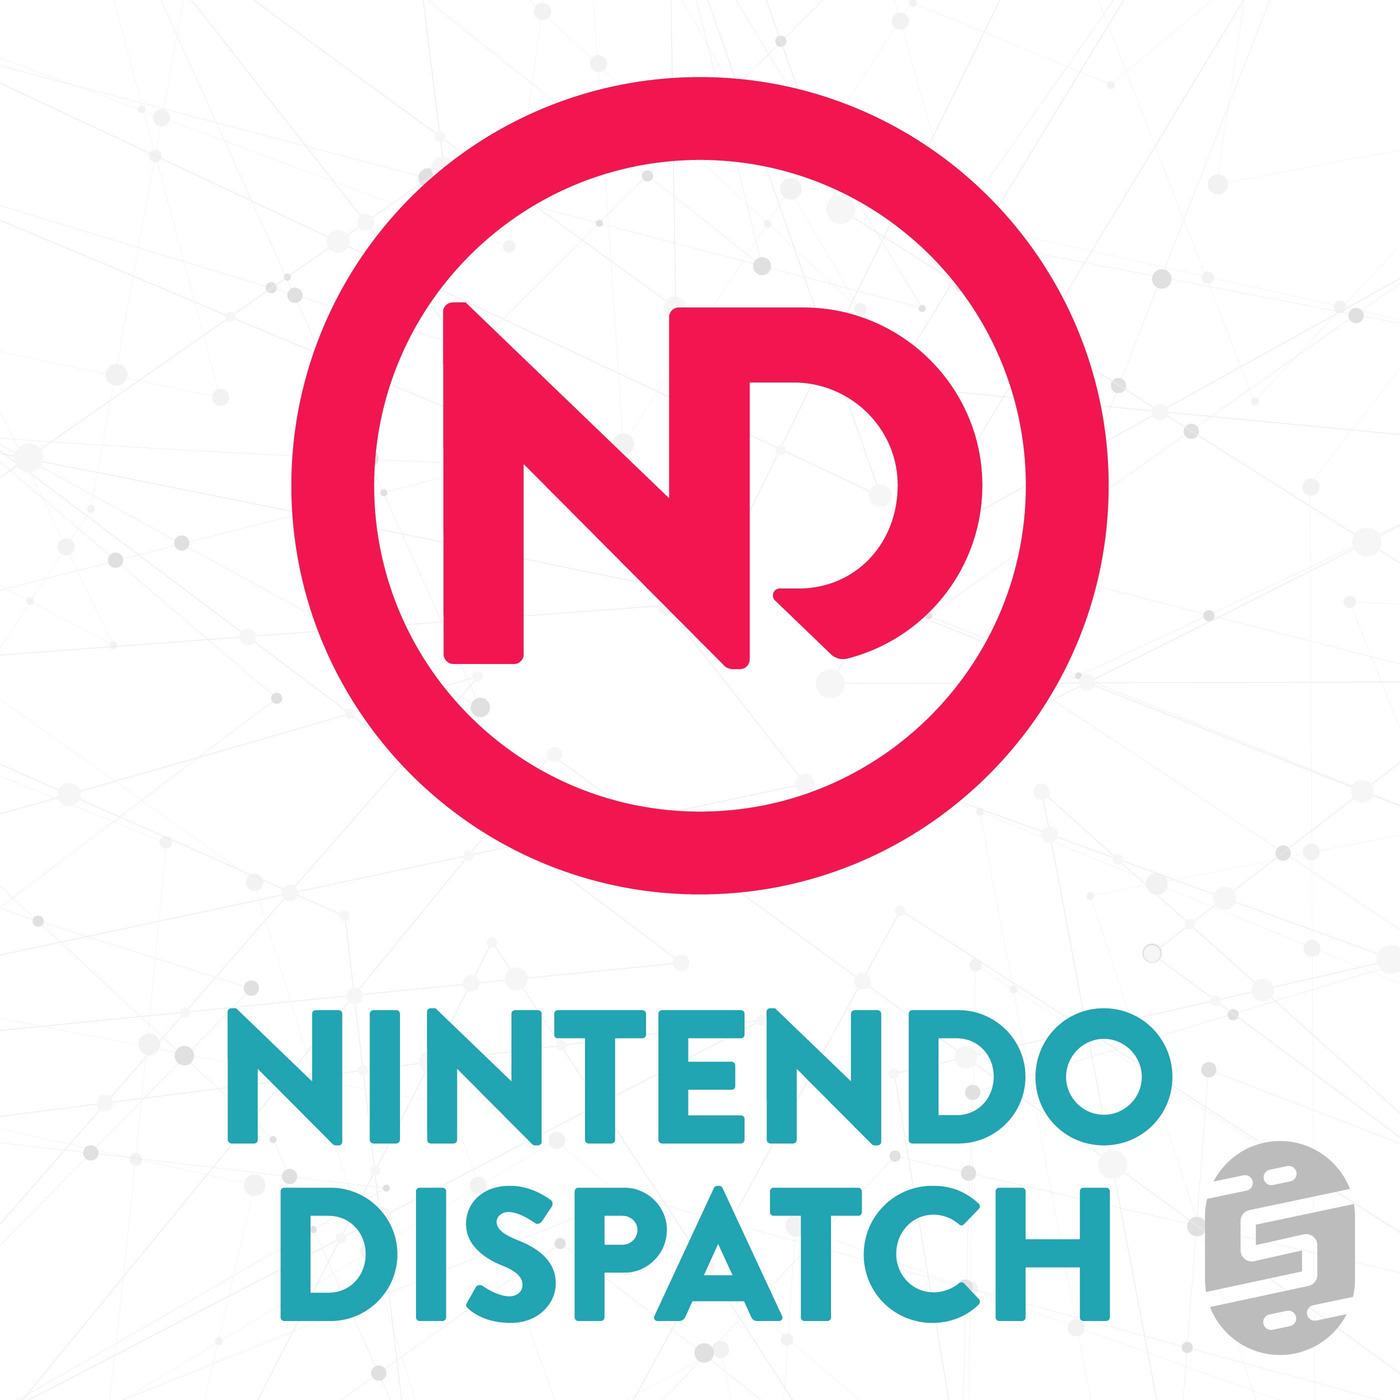 Nintendo Dispatch: 64: Nintendo Switch Lite, Dr. Mario World is Live, and NES Rewind